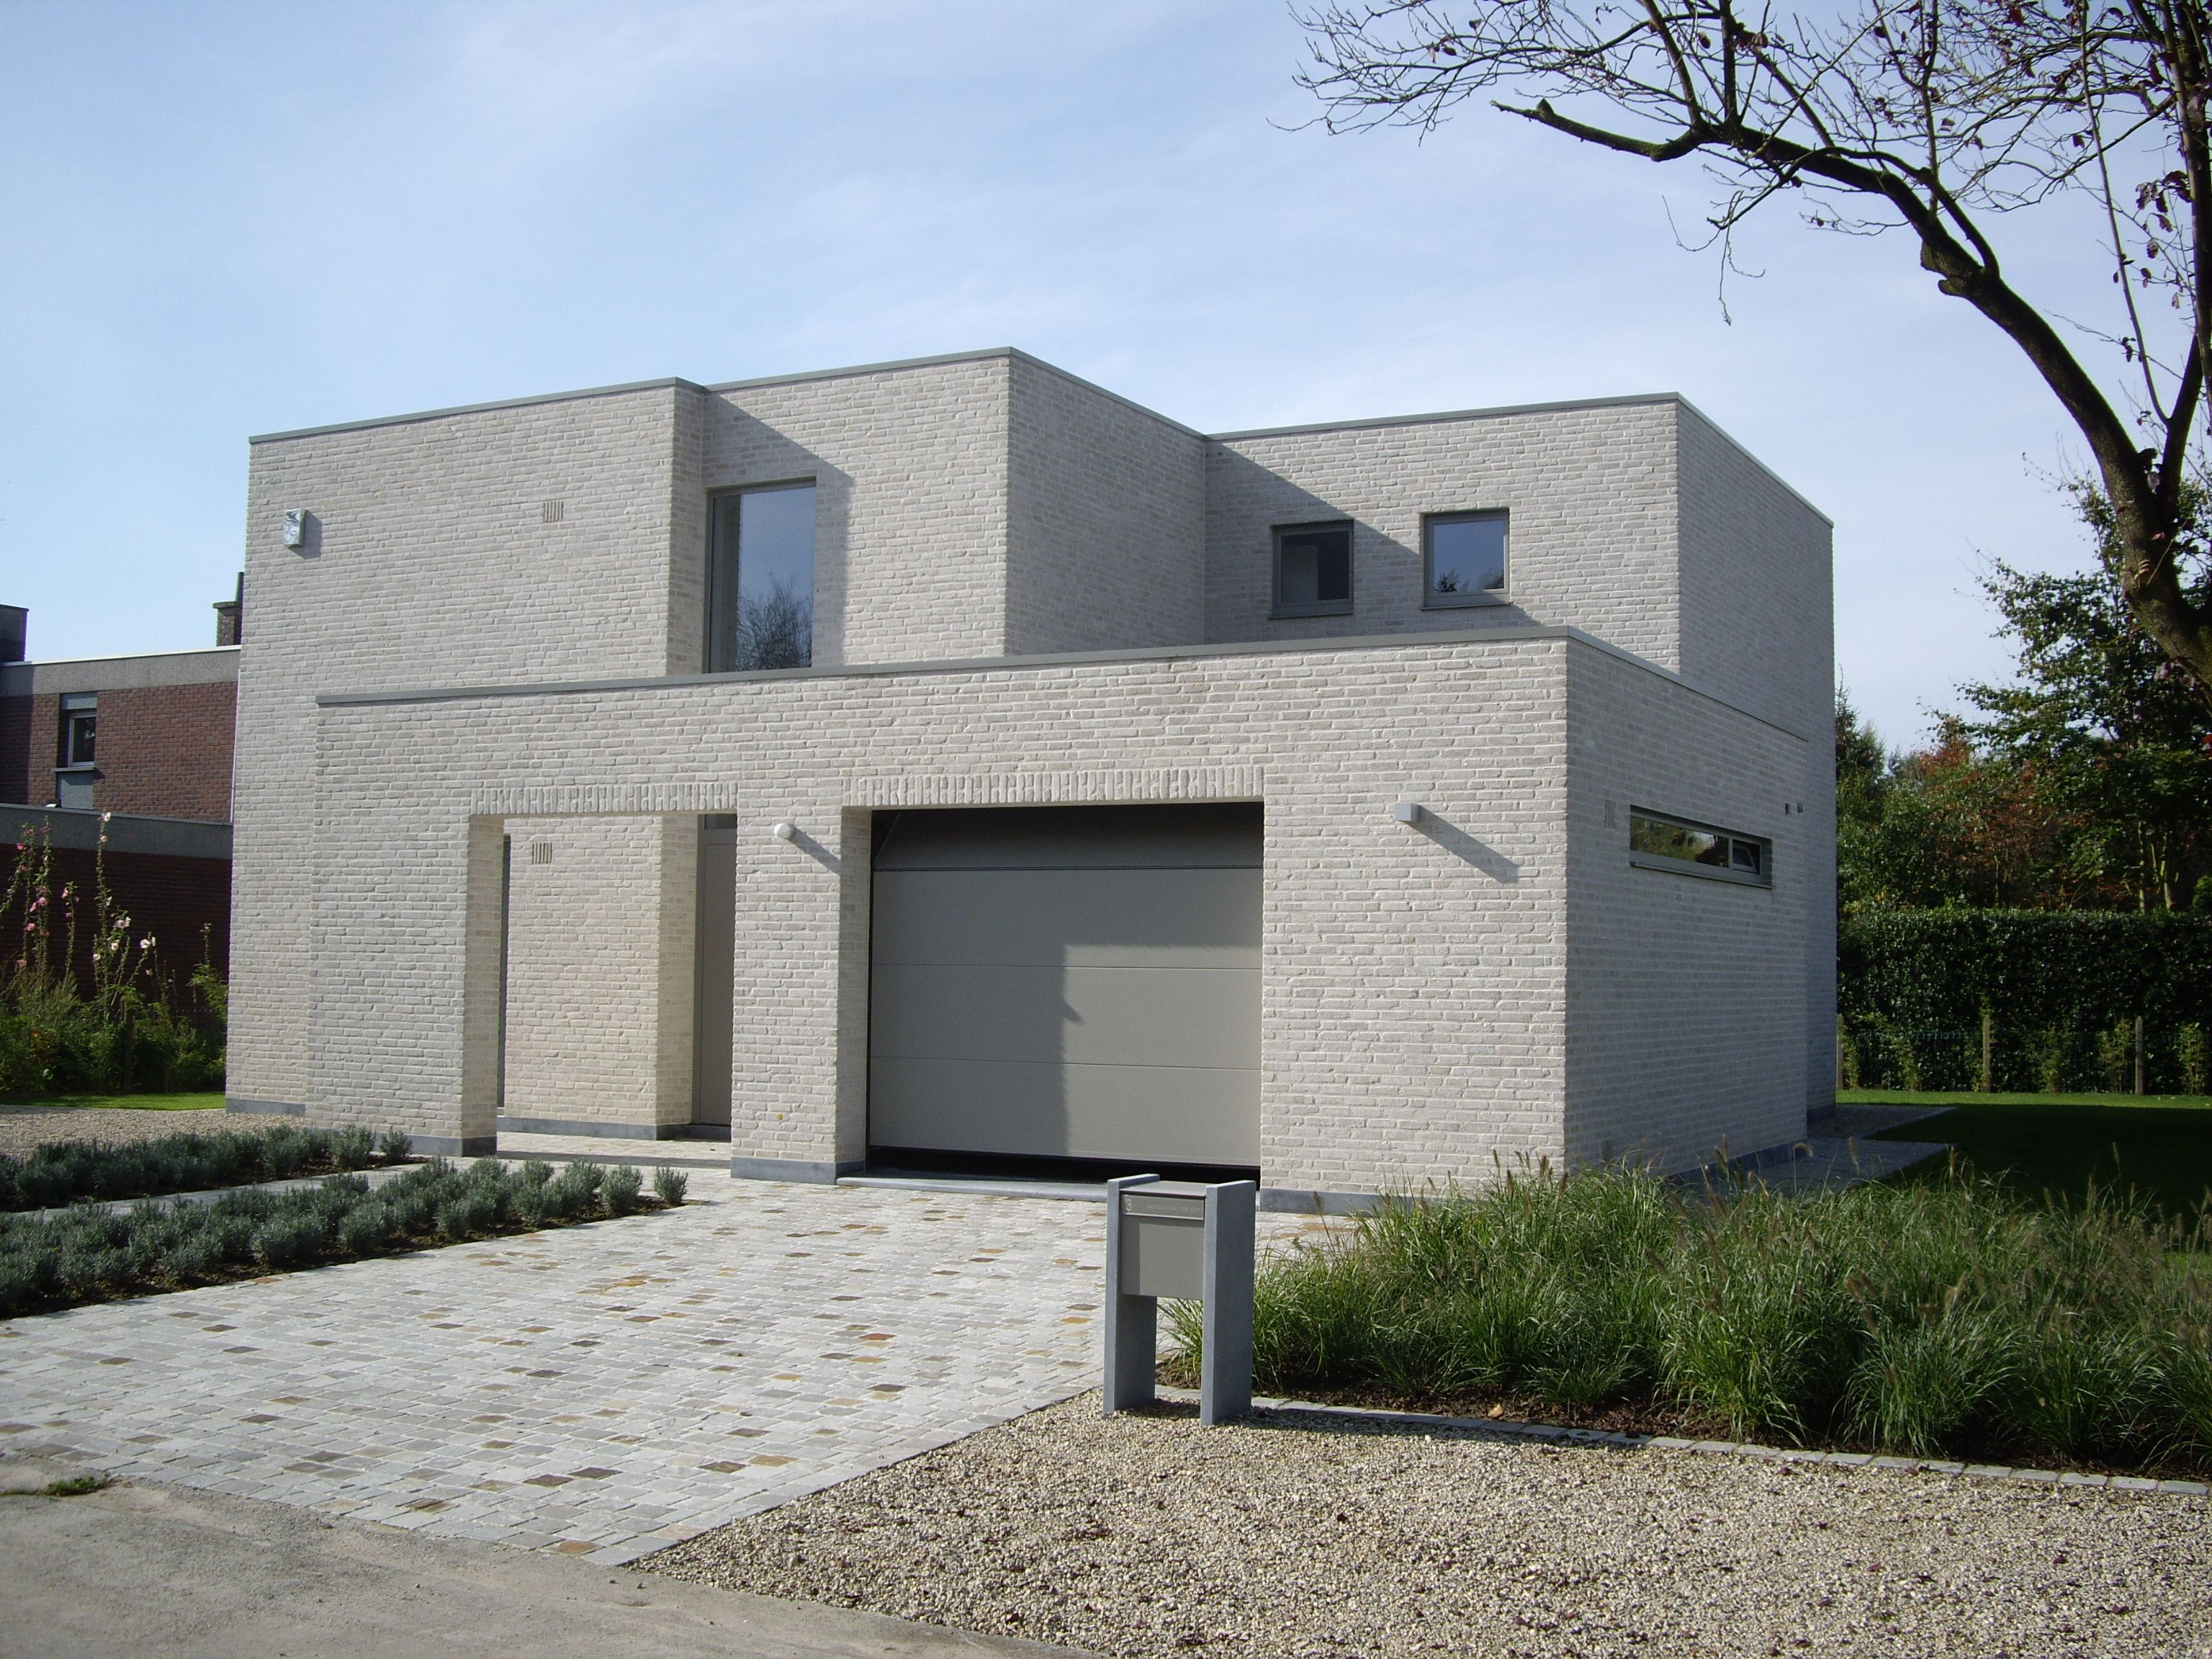 Priv woning drongen architect wouter cassiman architect wouter cassiman - Modern stenen huis ...